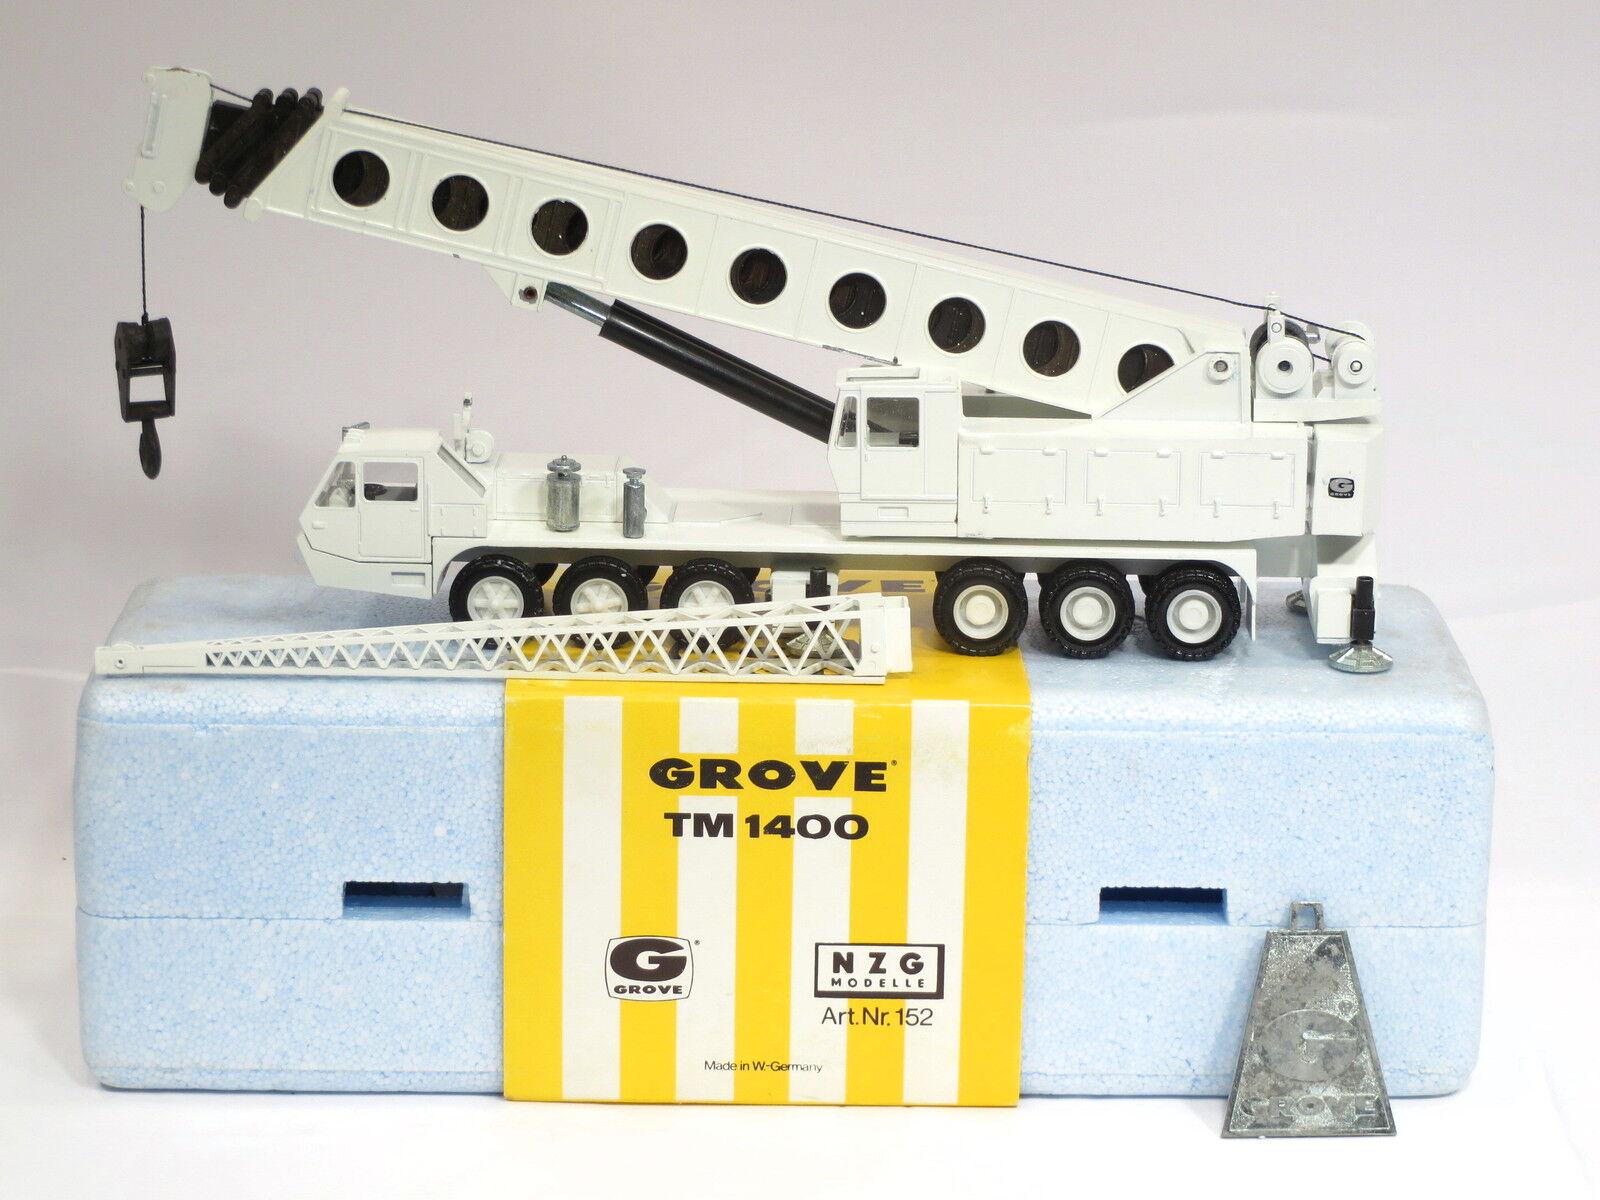 Grove TM1400 Crane -